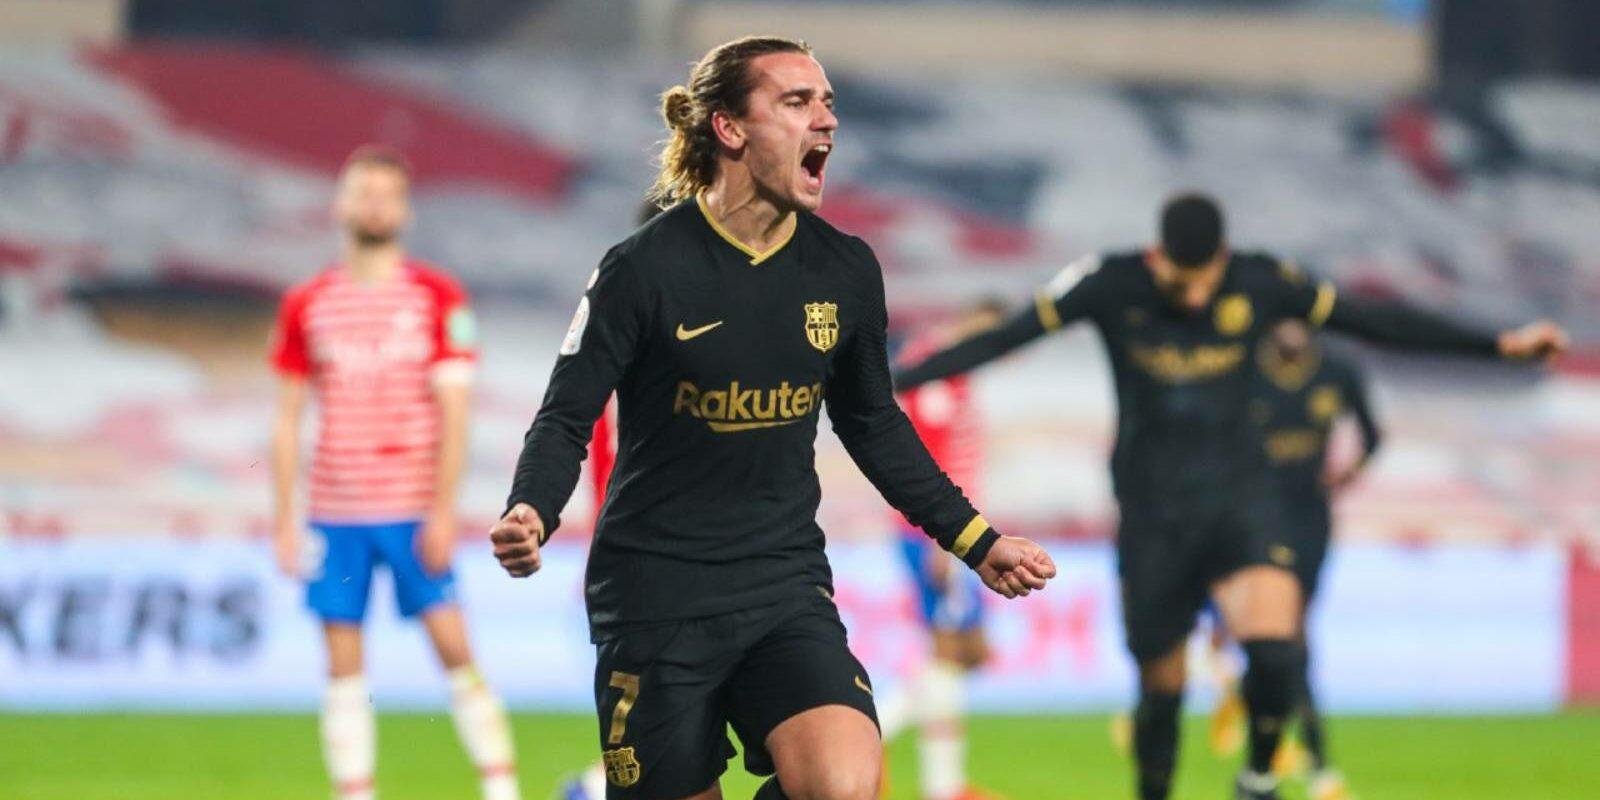 Griezmann celebra un gol al Nuevo los Cármenes   Europa Press